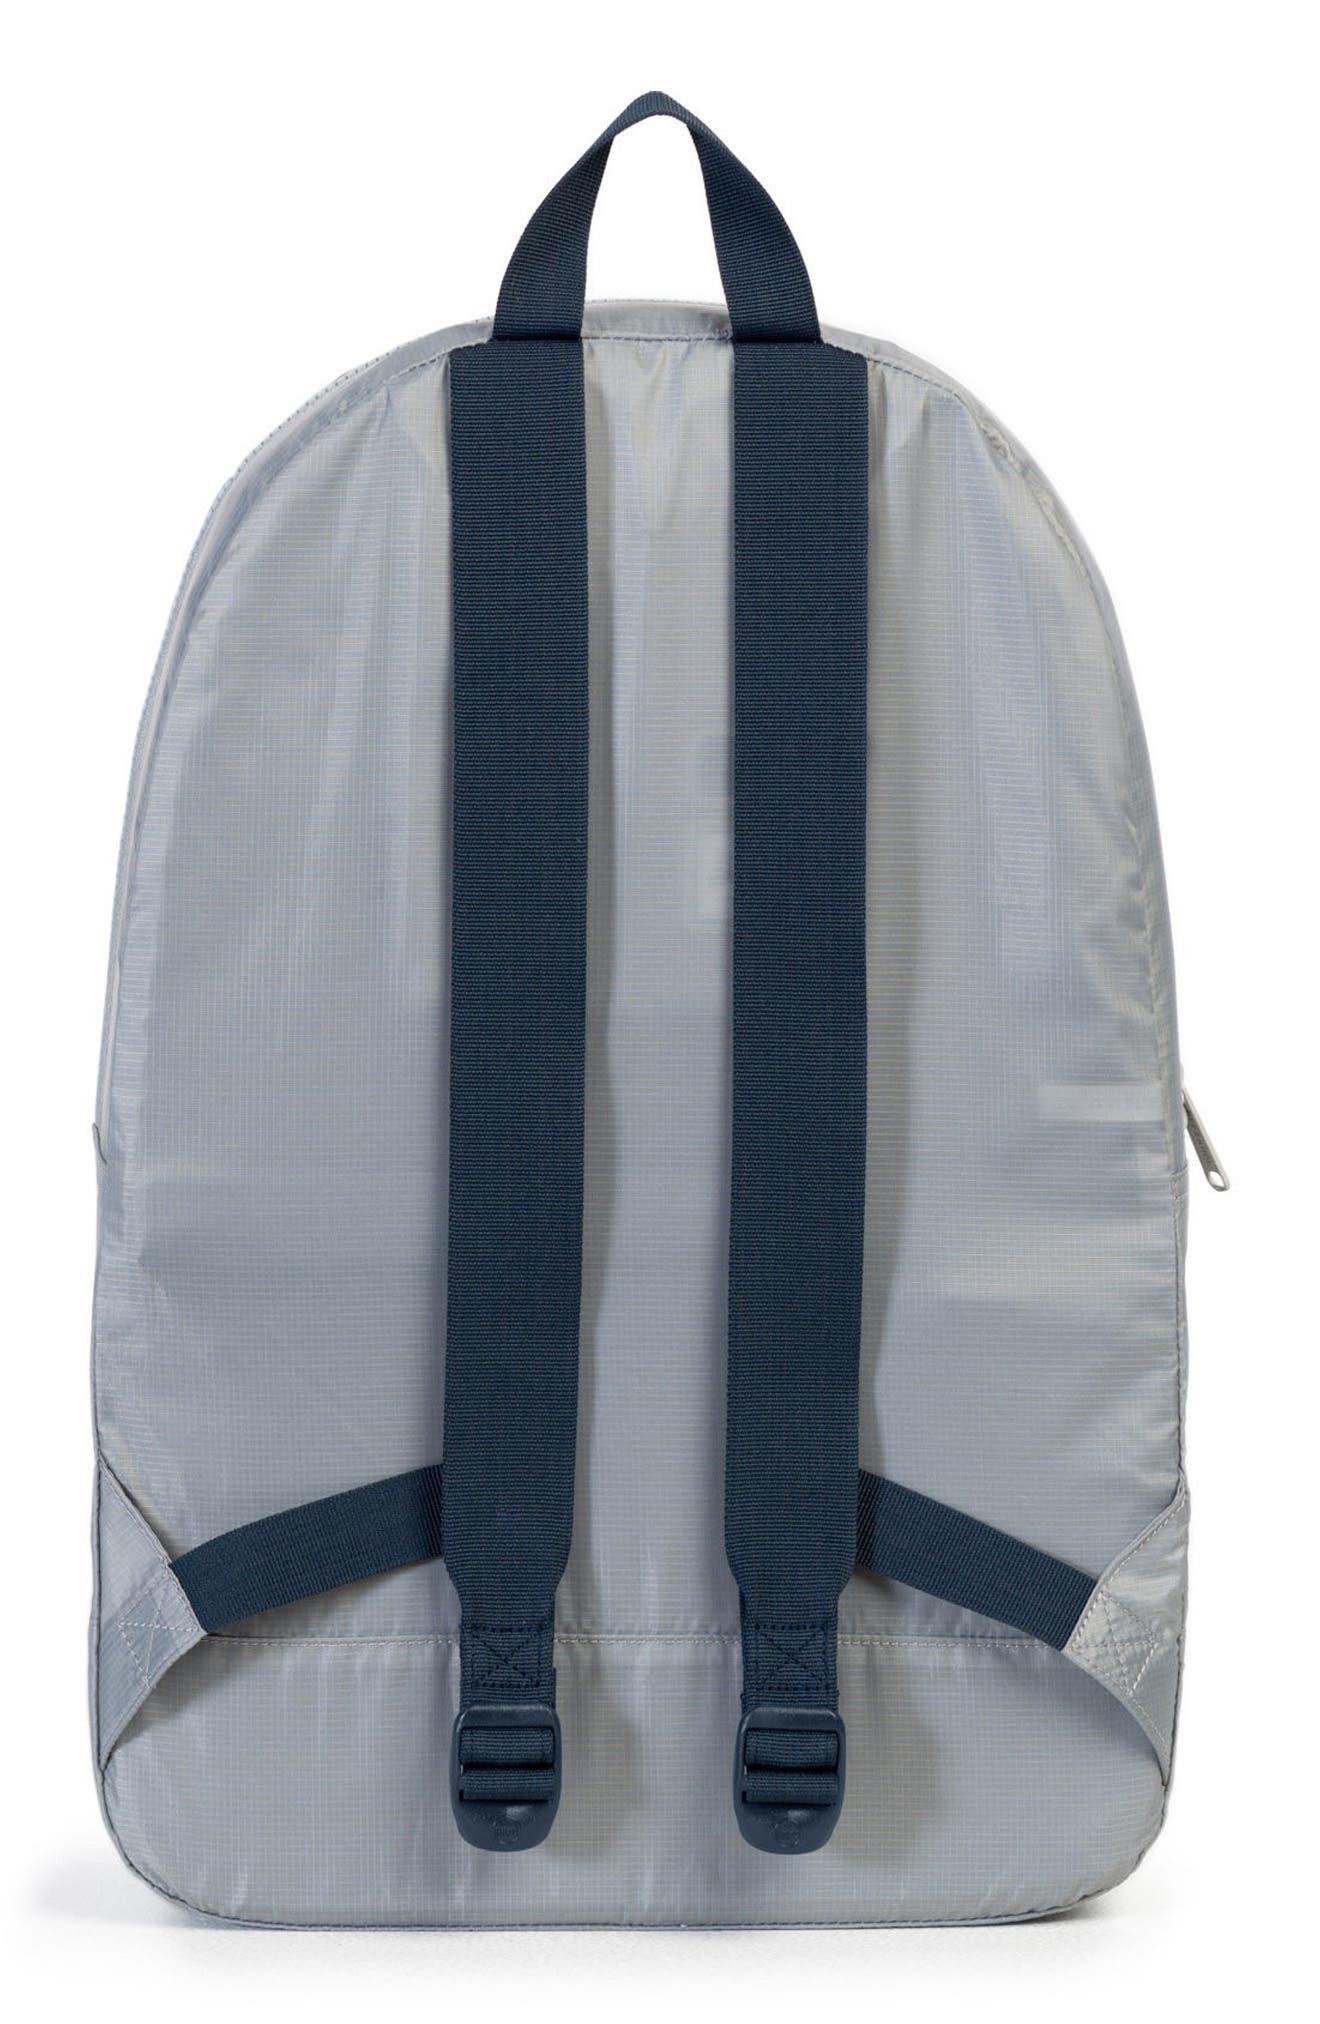 Packable - MLB American League Backpack,                             Alternate thumbnail 4, color,                             New York Yankees